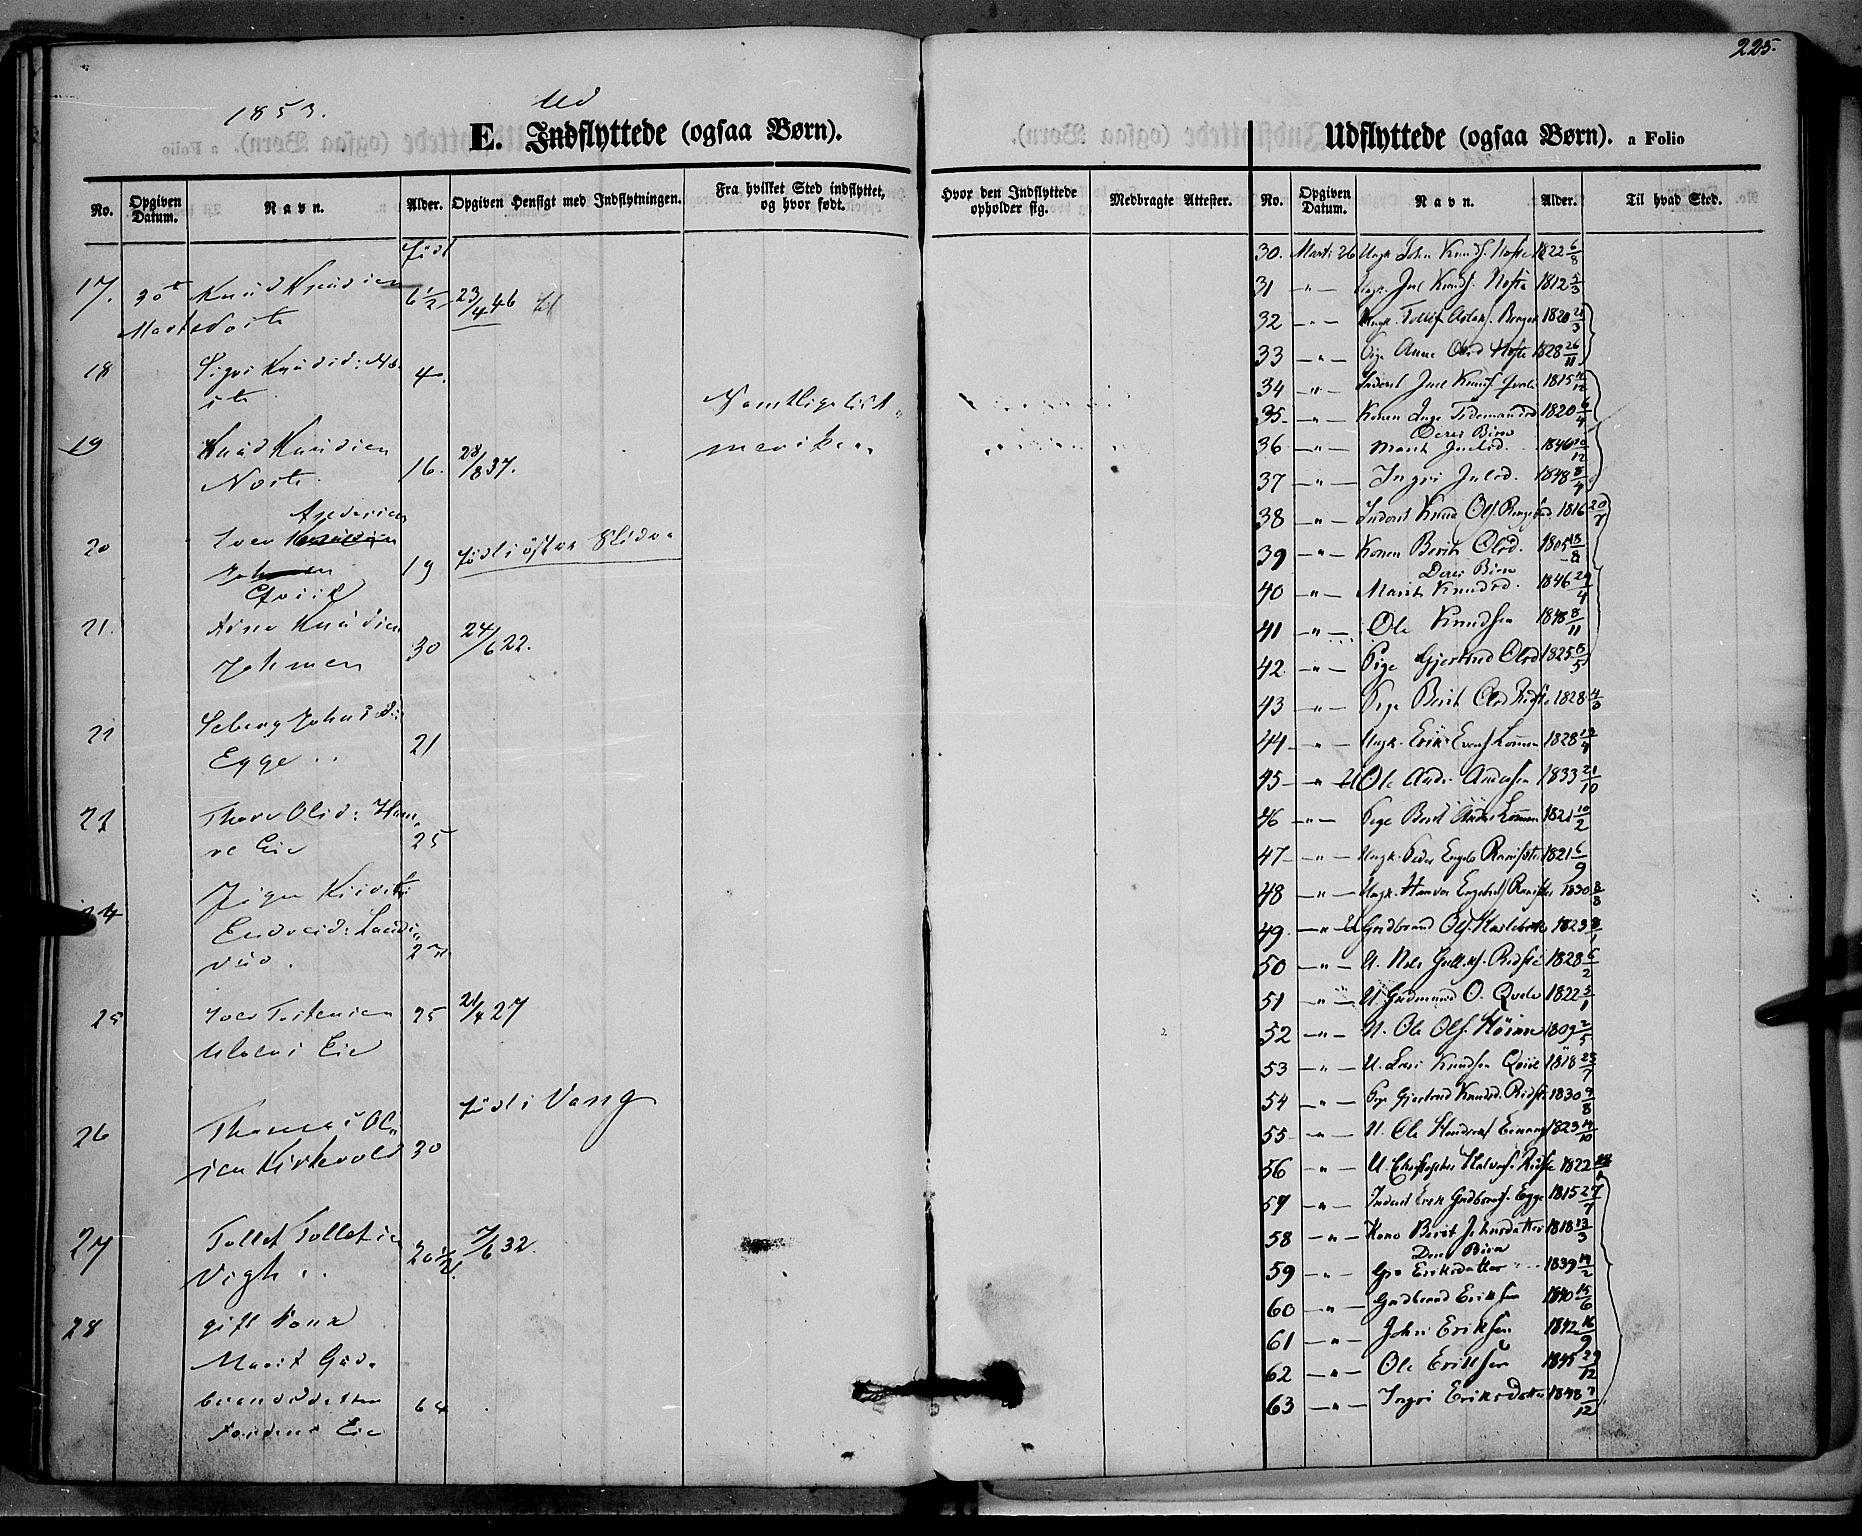 SAH, Vestre Slidre prestekontor, Ministerialbok nr. 1, 1844-1855, s. 225